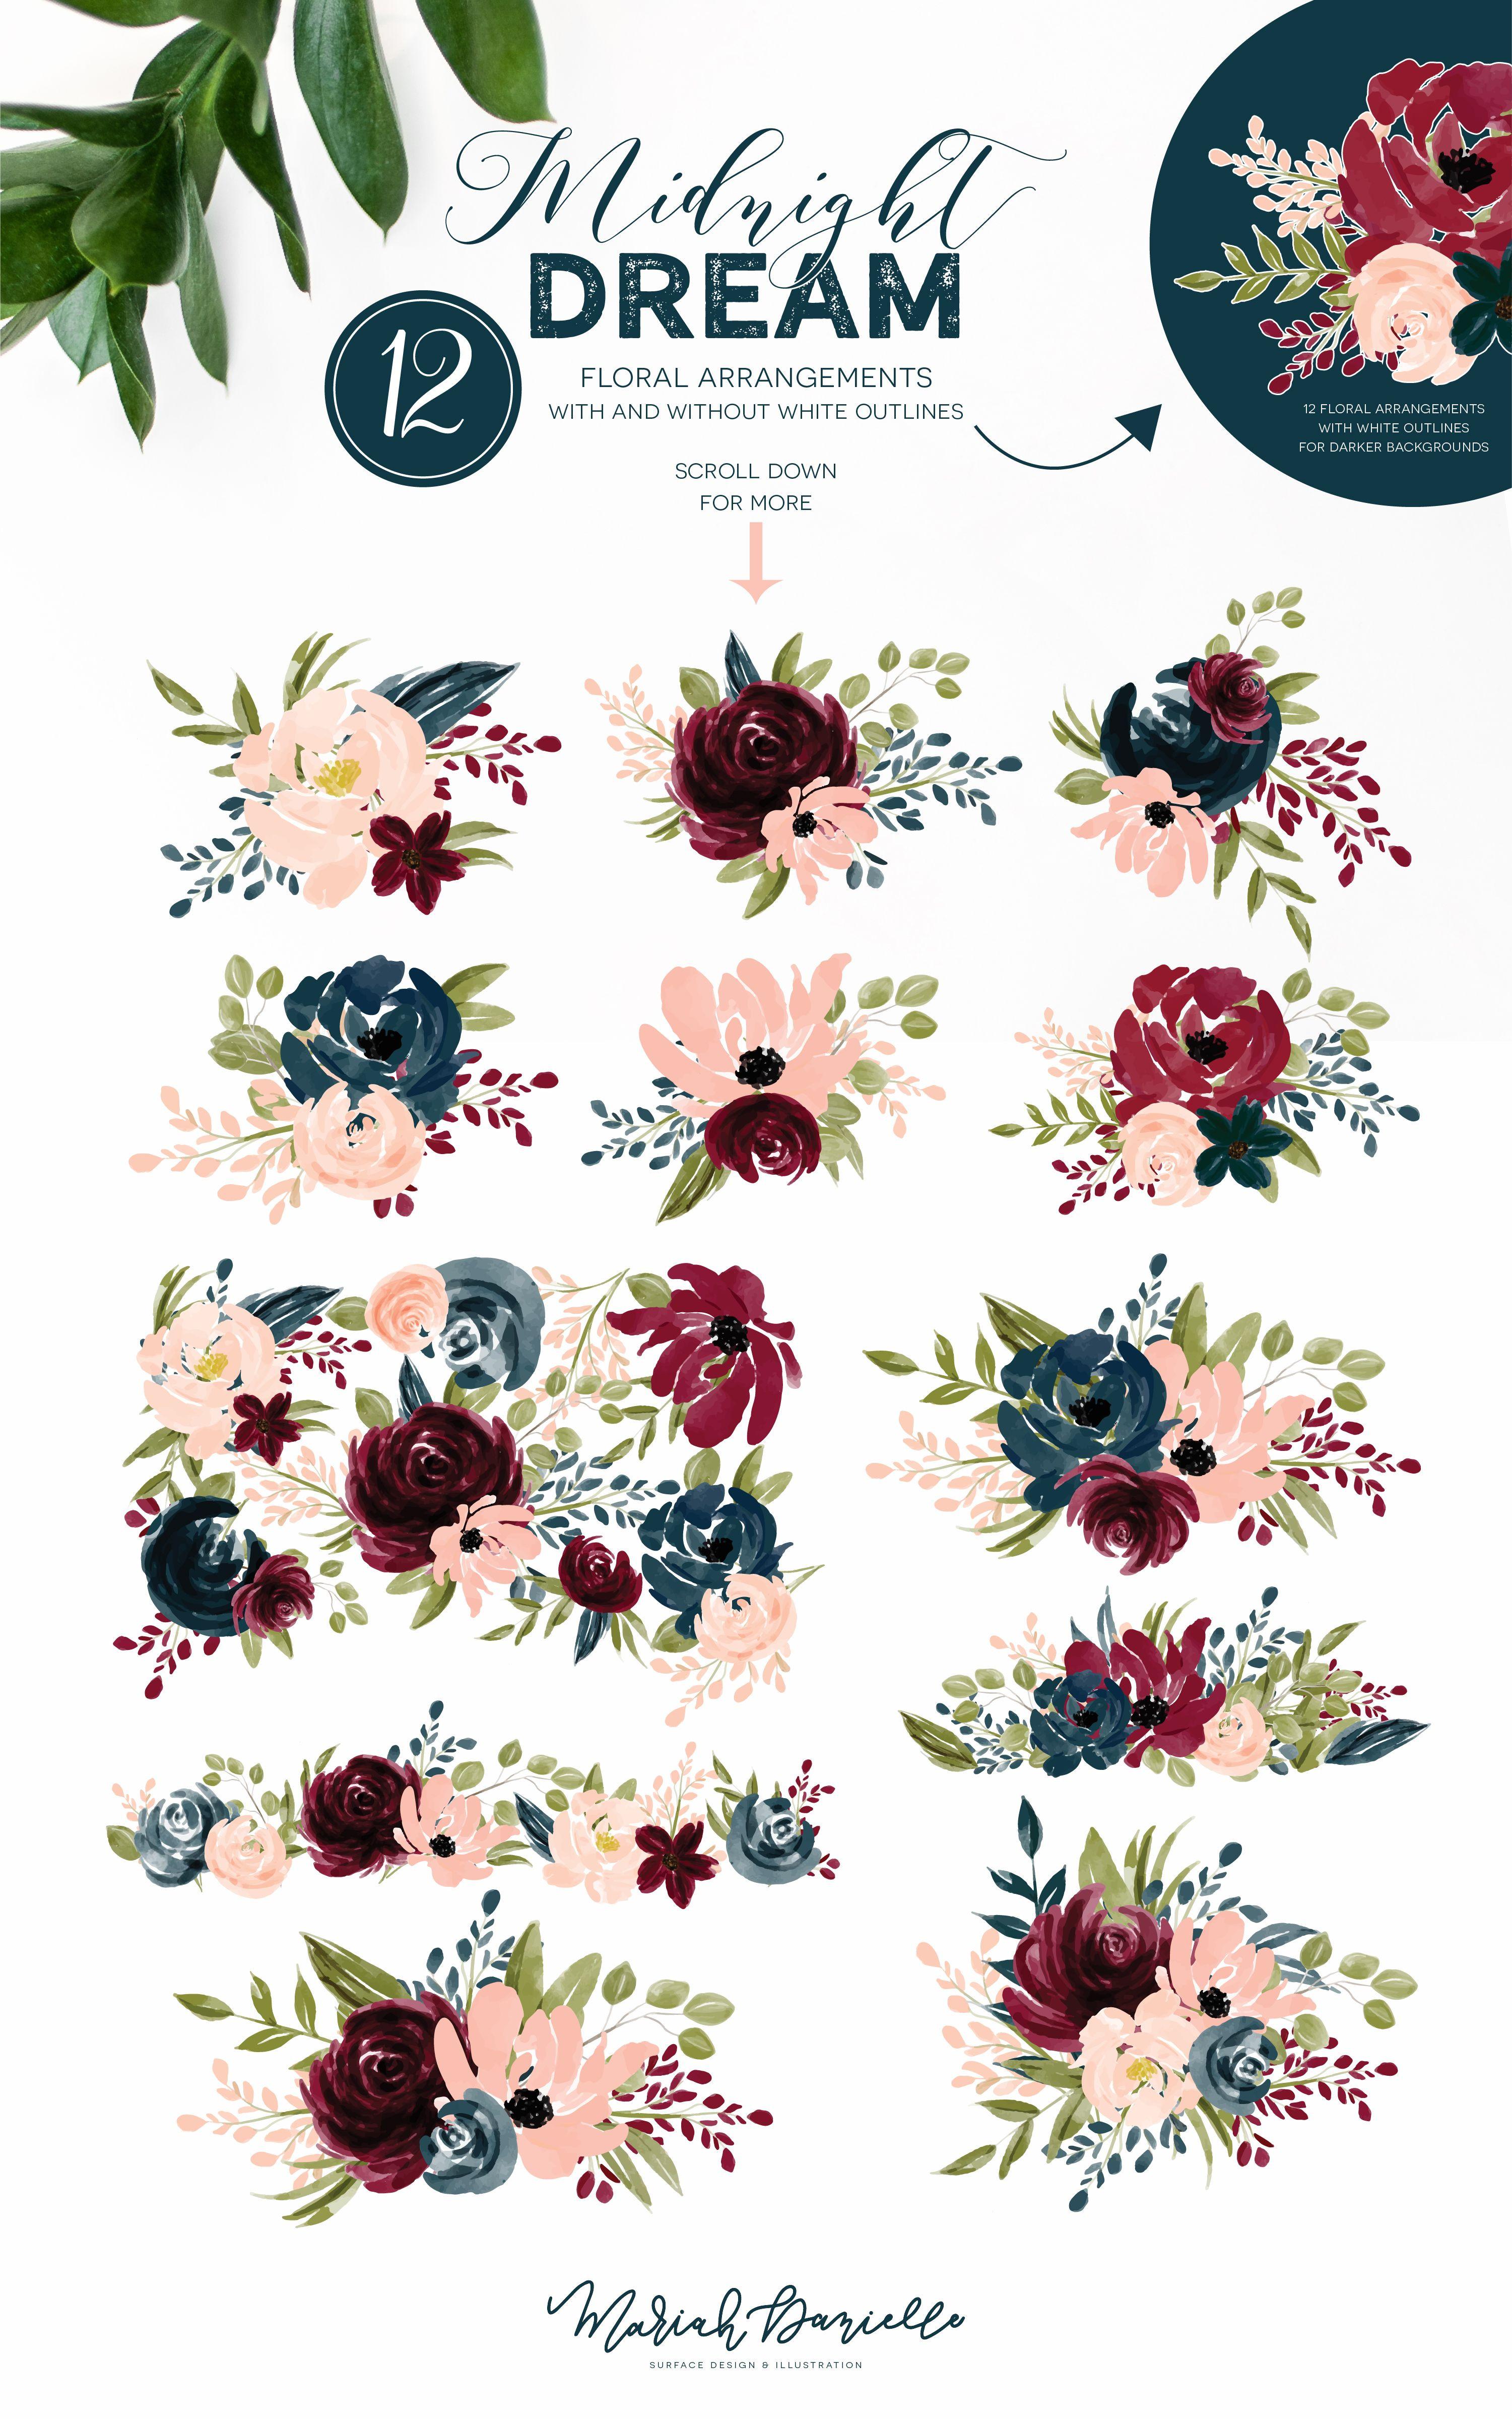 Burgundy & Navy Flower Graphic Set Illustrations Hand Drawn Floral Illustrations